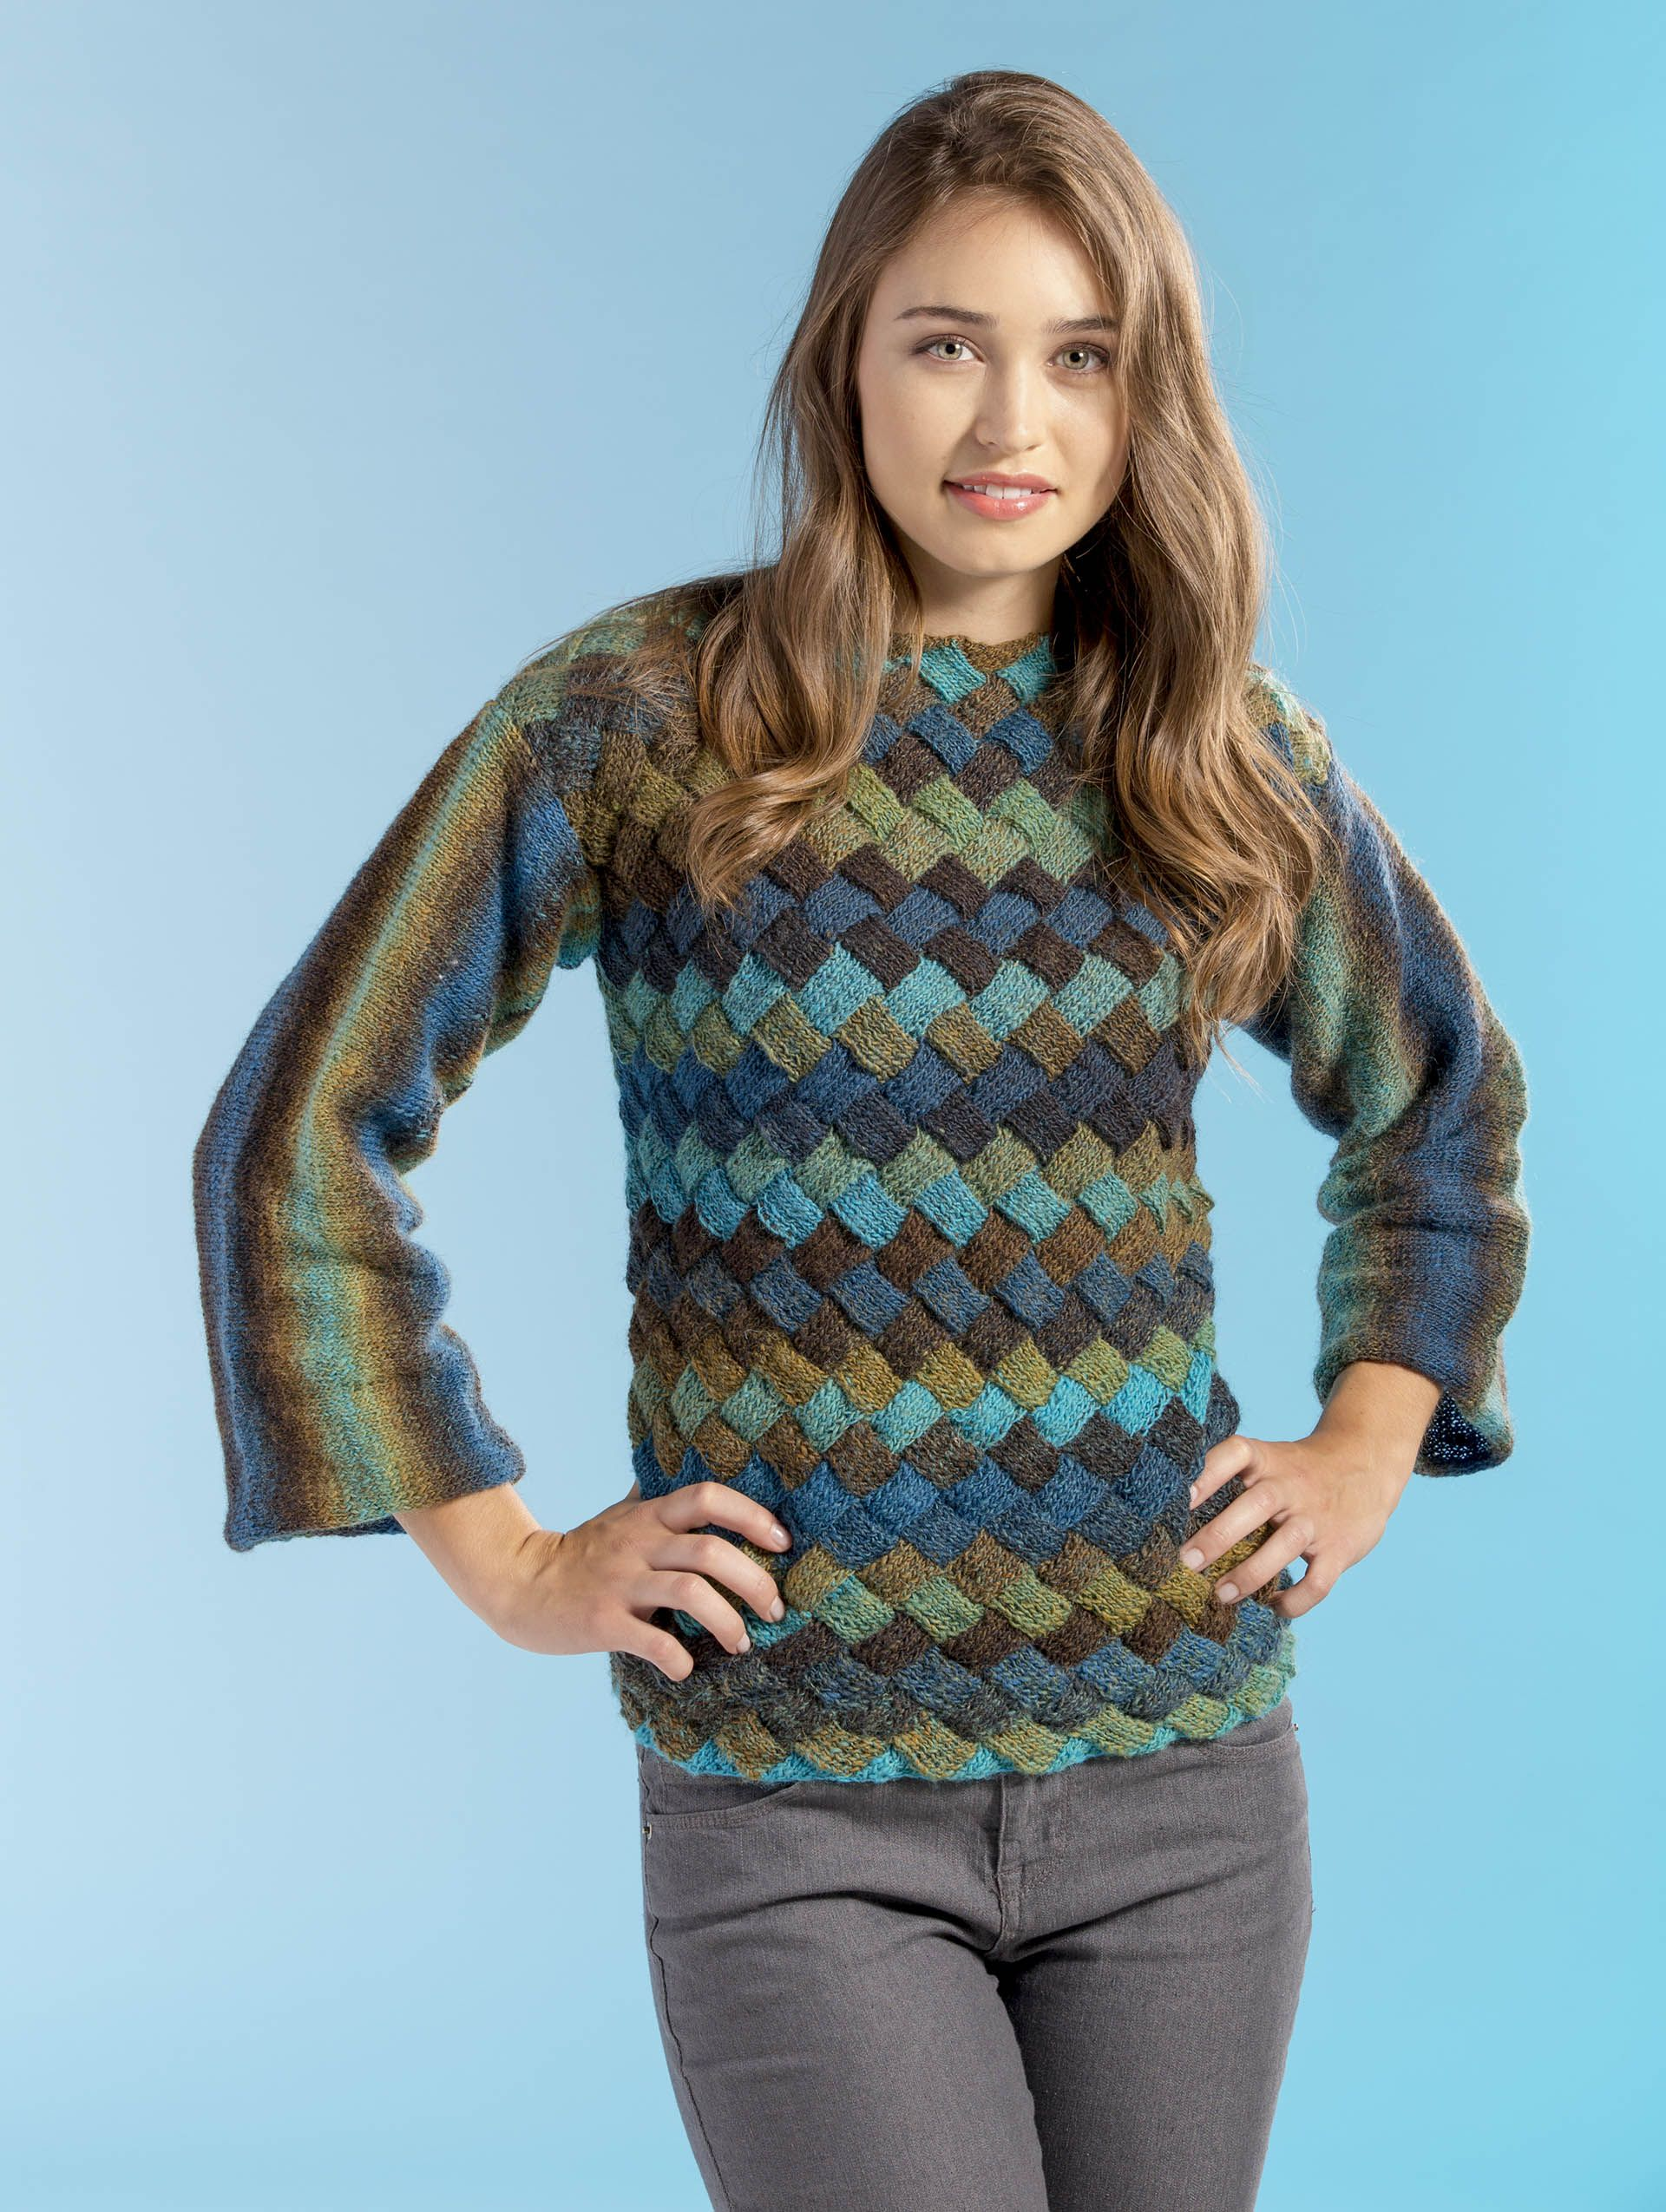 b23189719788ce Free entrelac knitting pattern - the Landscape Sweater in Wisdom Yarns  Poems Sock